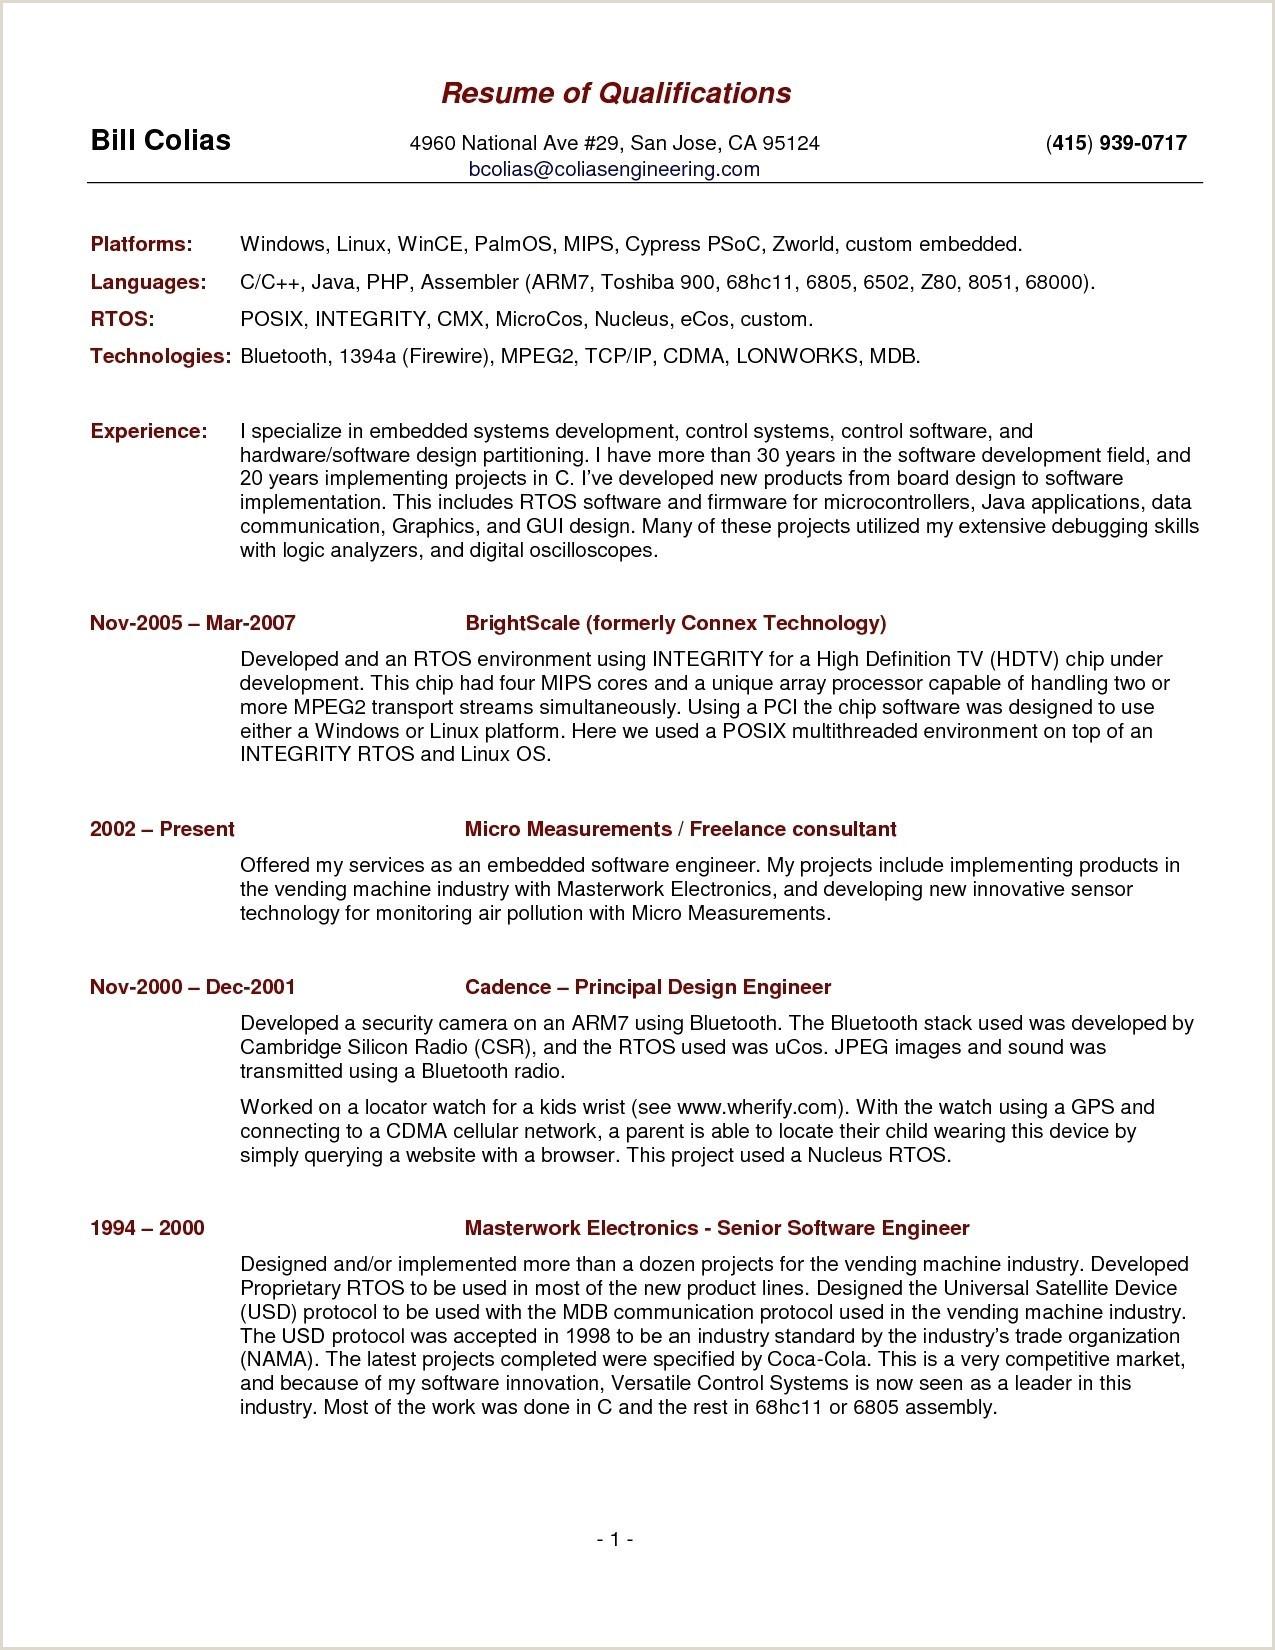 Artistic Resume Templates – Kizi games